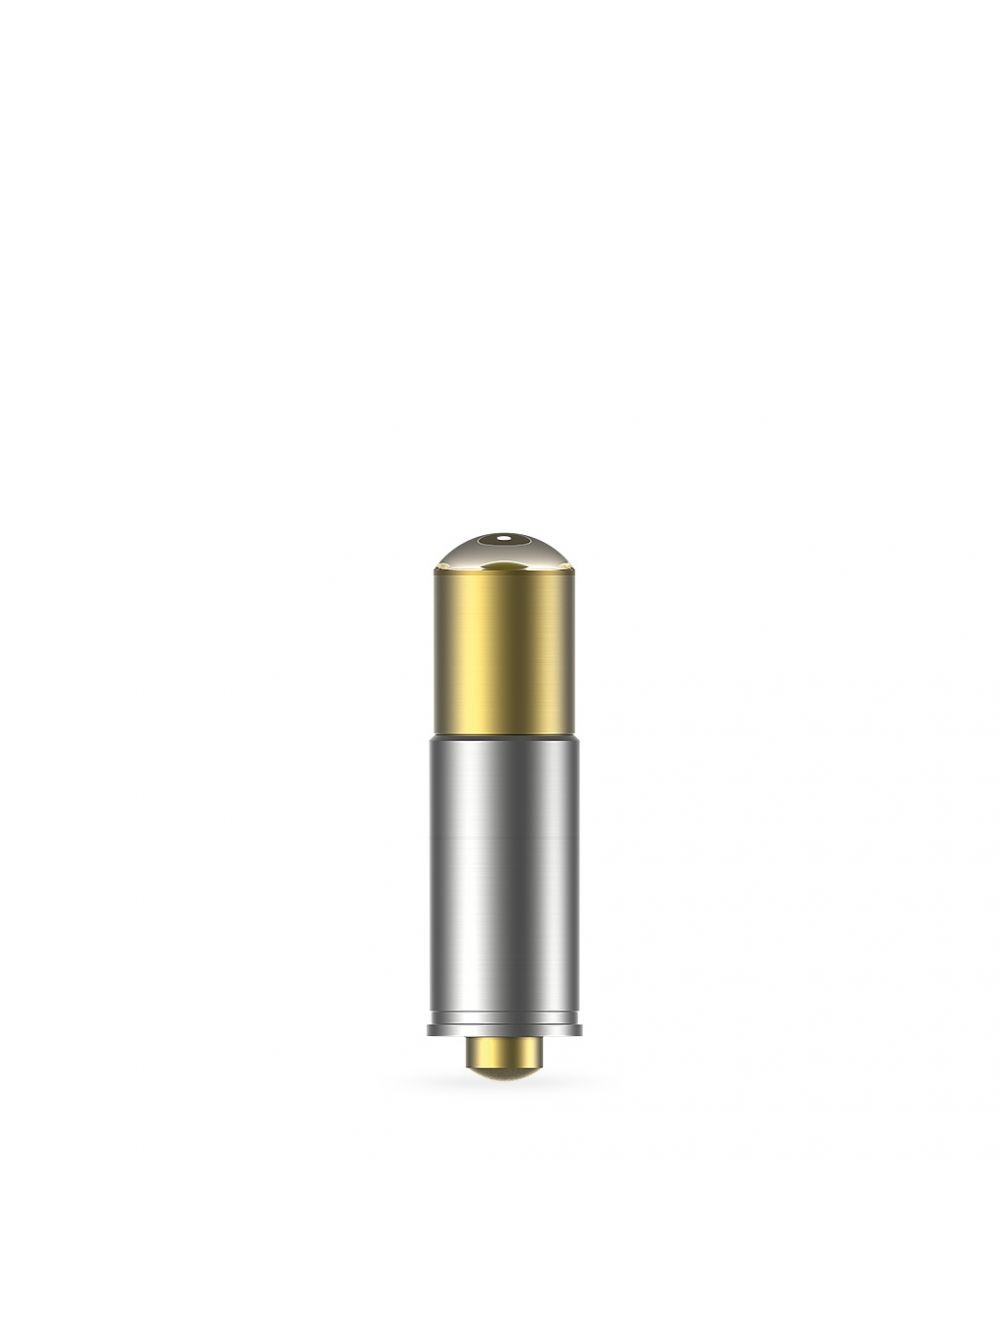 MK-dent LED Lampe BU8012WH